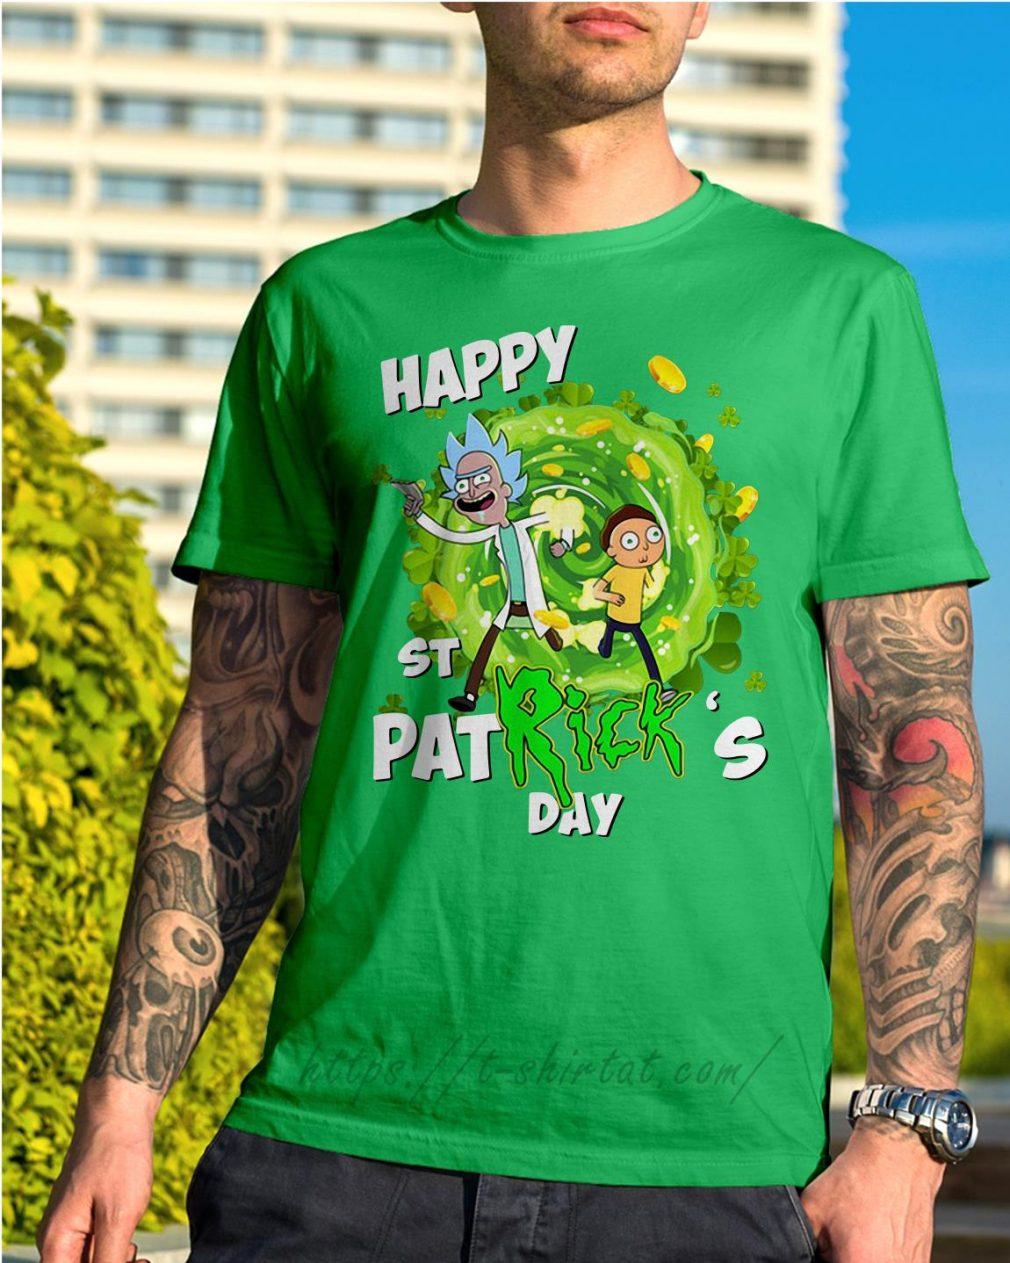 Happy St PatRick's day Rick Sanchez Shirt green